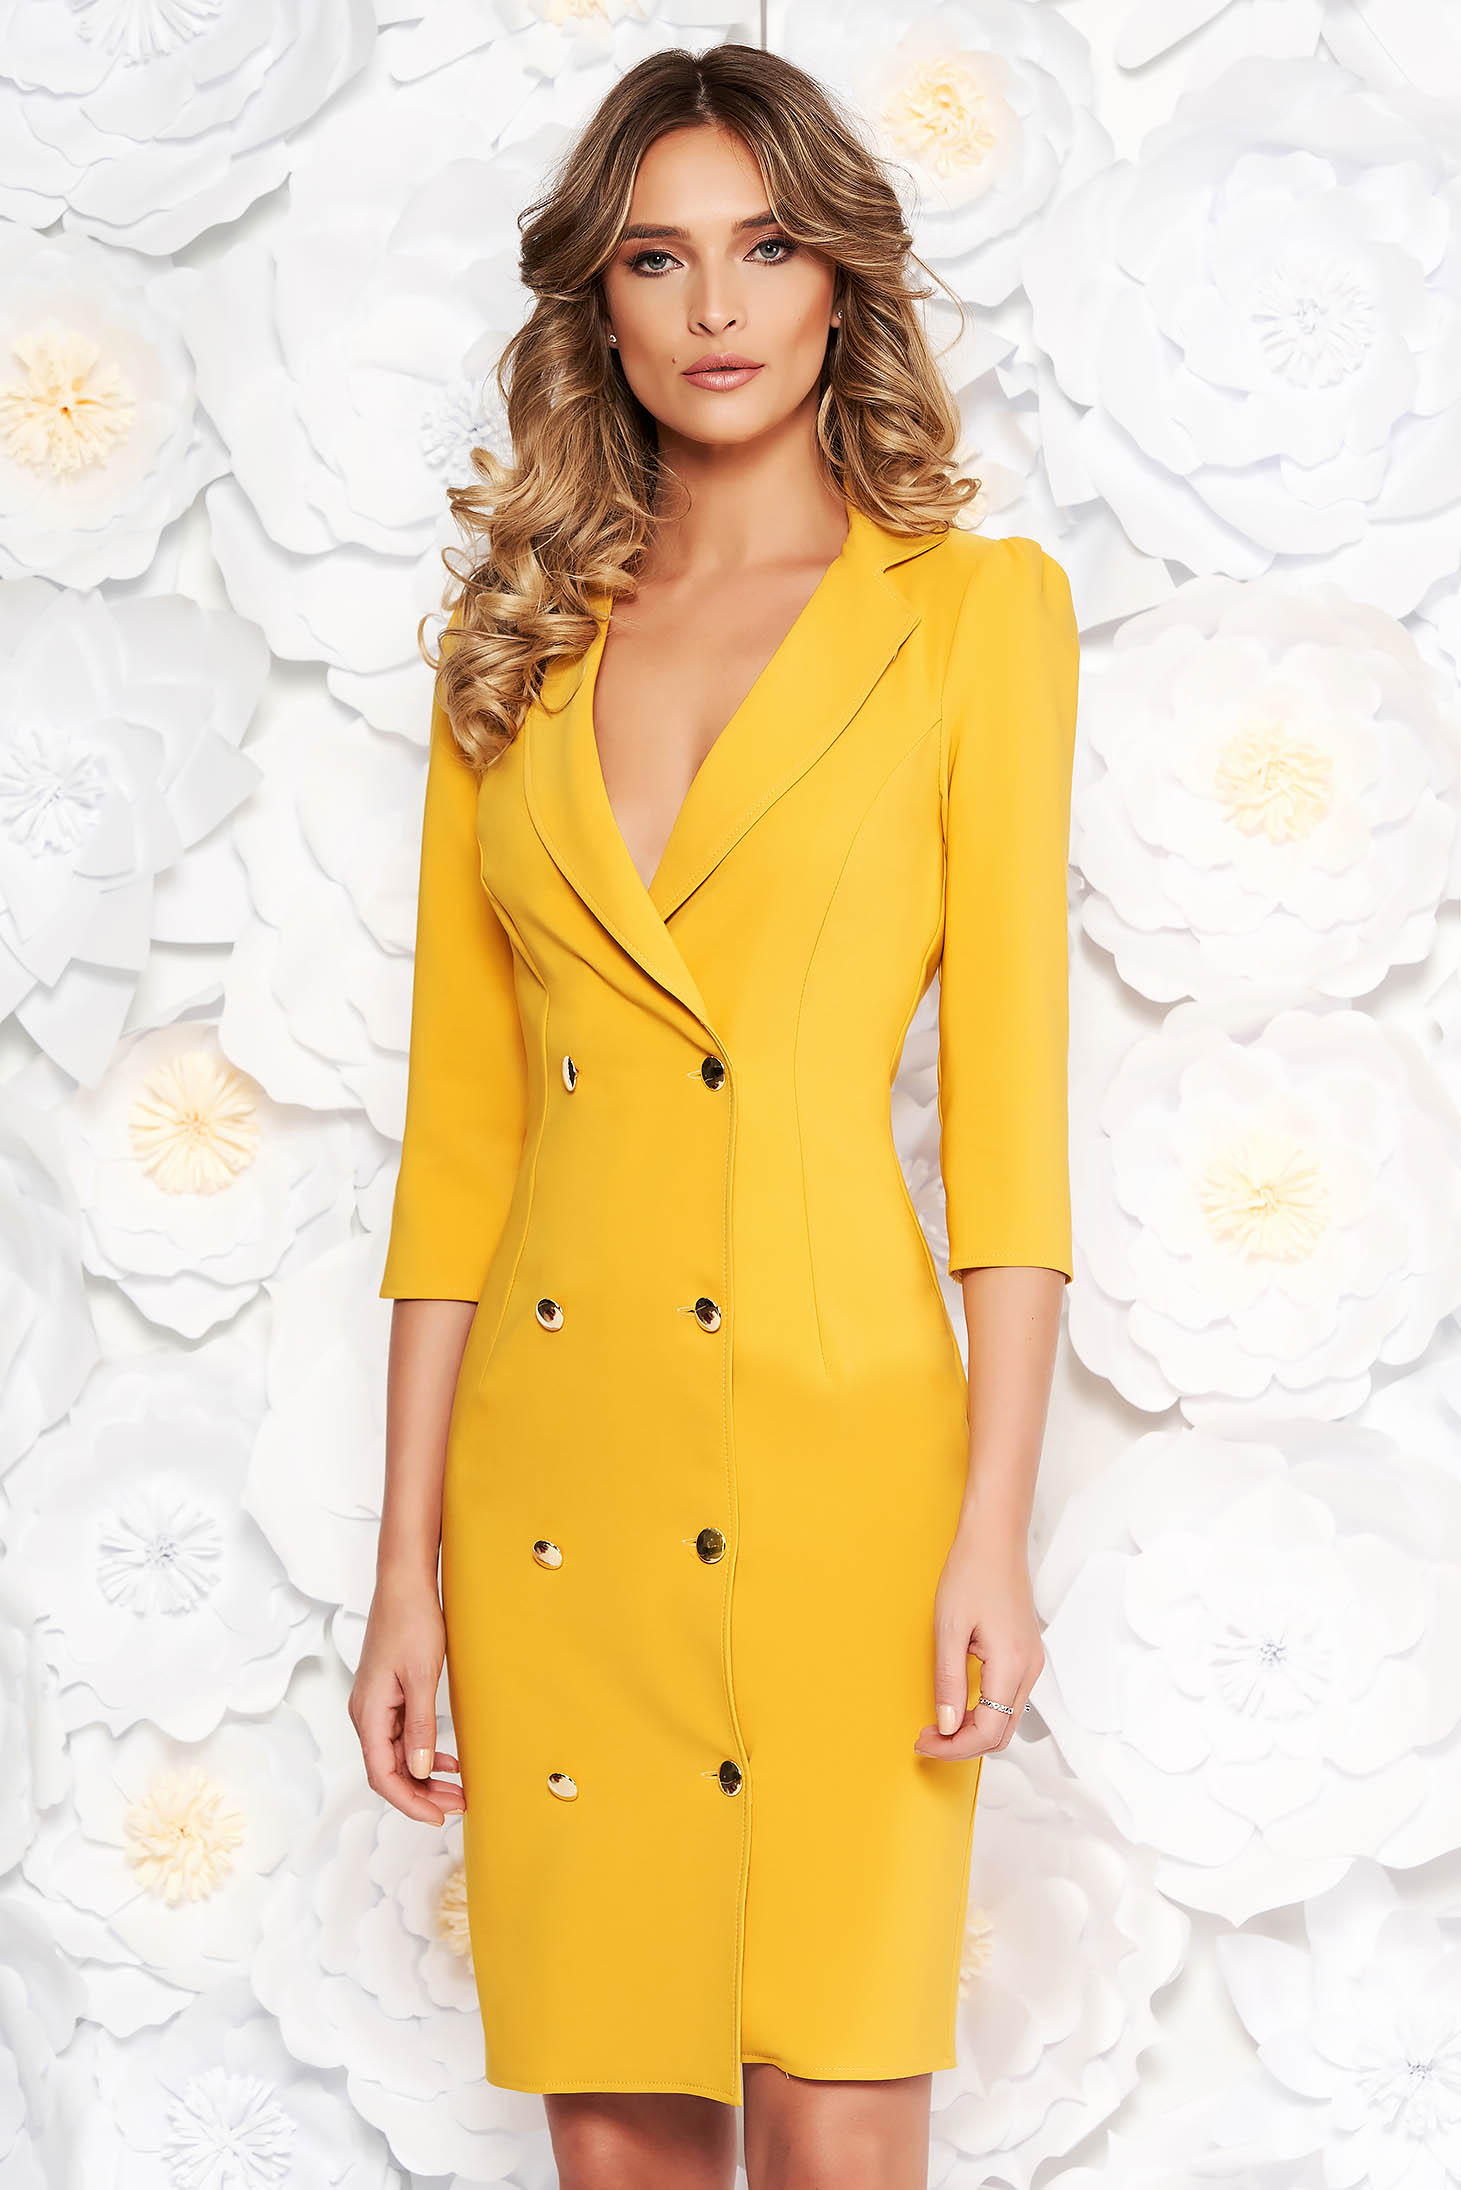 Artista mustard elegant blazer type dress slightly elastic fabric wrap around with button accessories